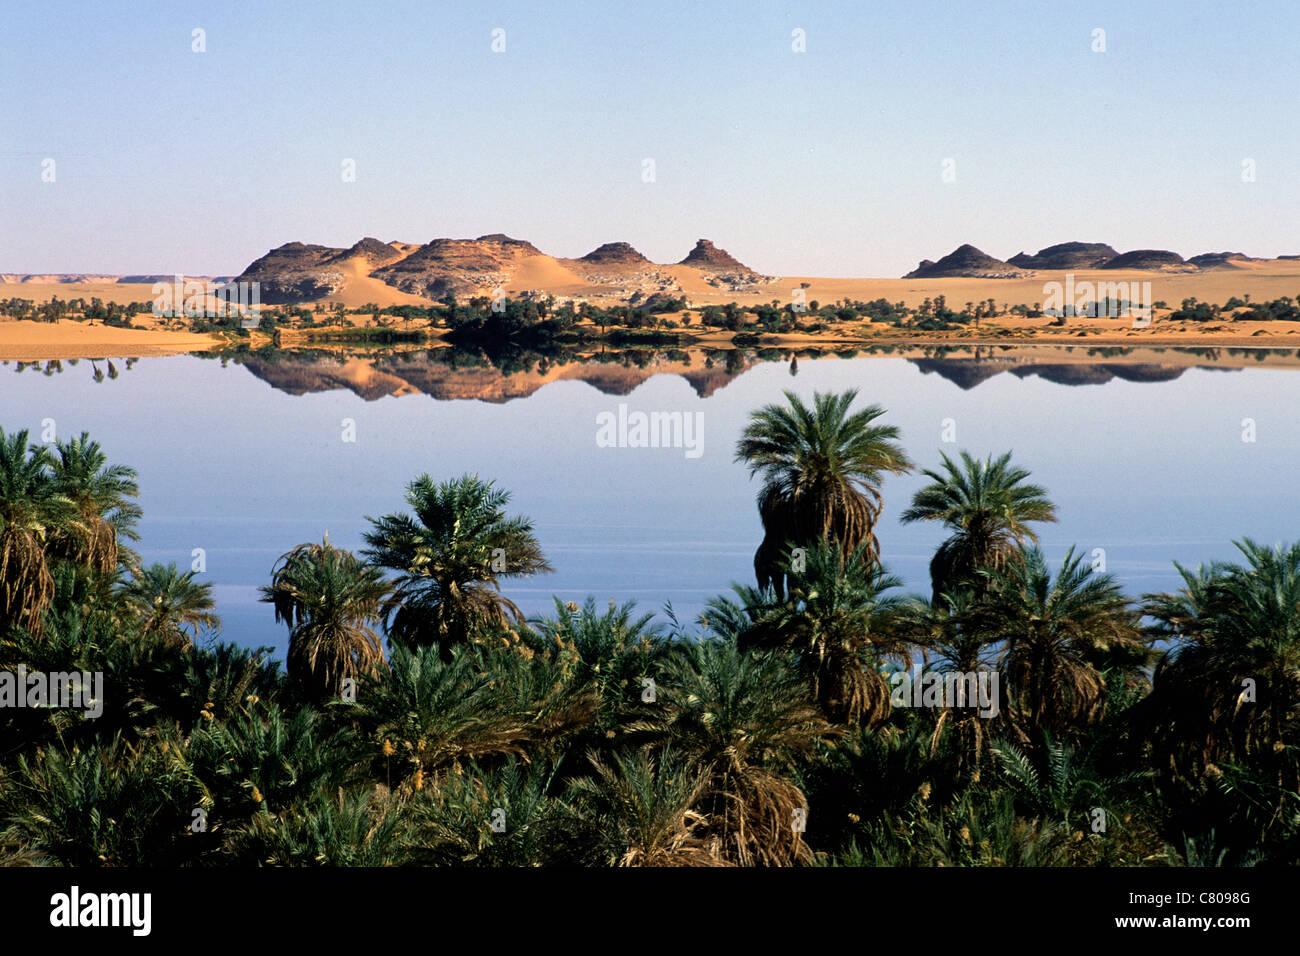 Africa, Chad, Ounianga Serir, Yoa lake - Stock Image